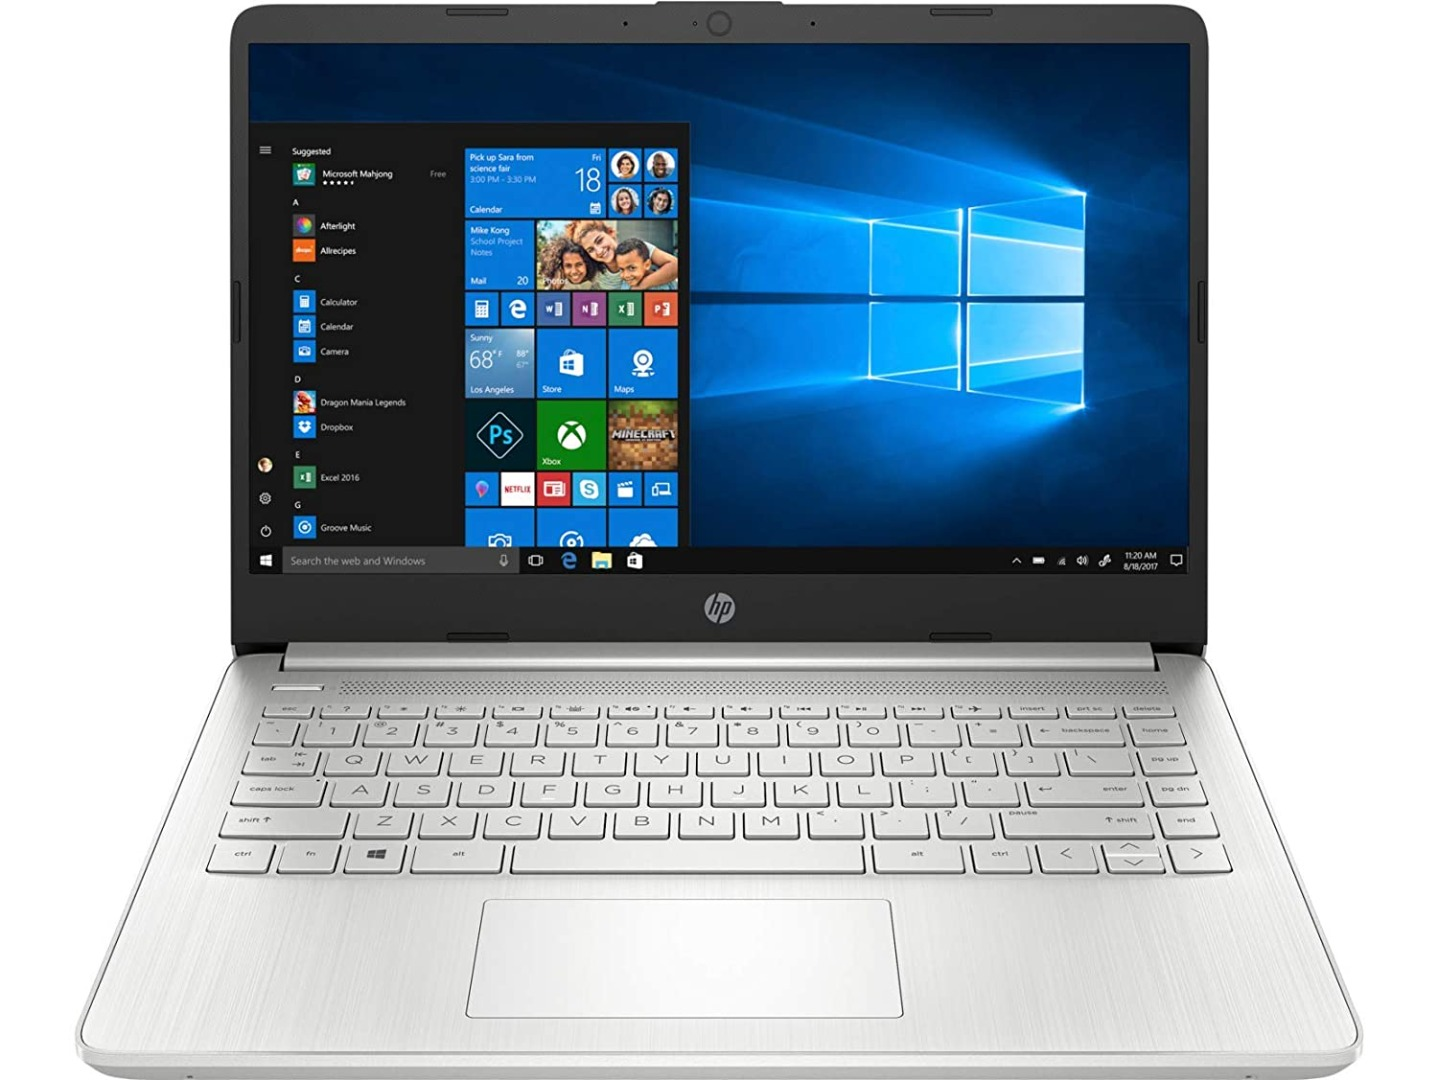 HP 14 11th Gen Intel Core i5 Processor 14-inch(35.6 cm) FHD Laptop (8GB/512GB/Windows 10/MS Office/Natural Silver/1.46Kg), 14s-dr2016tu